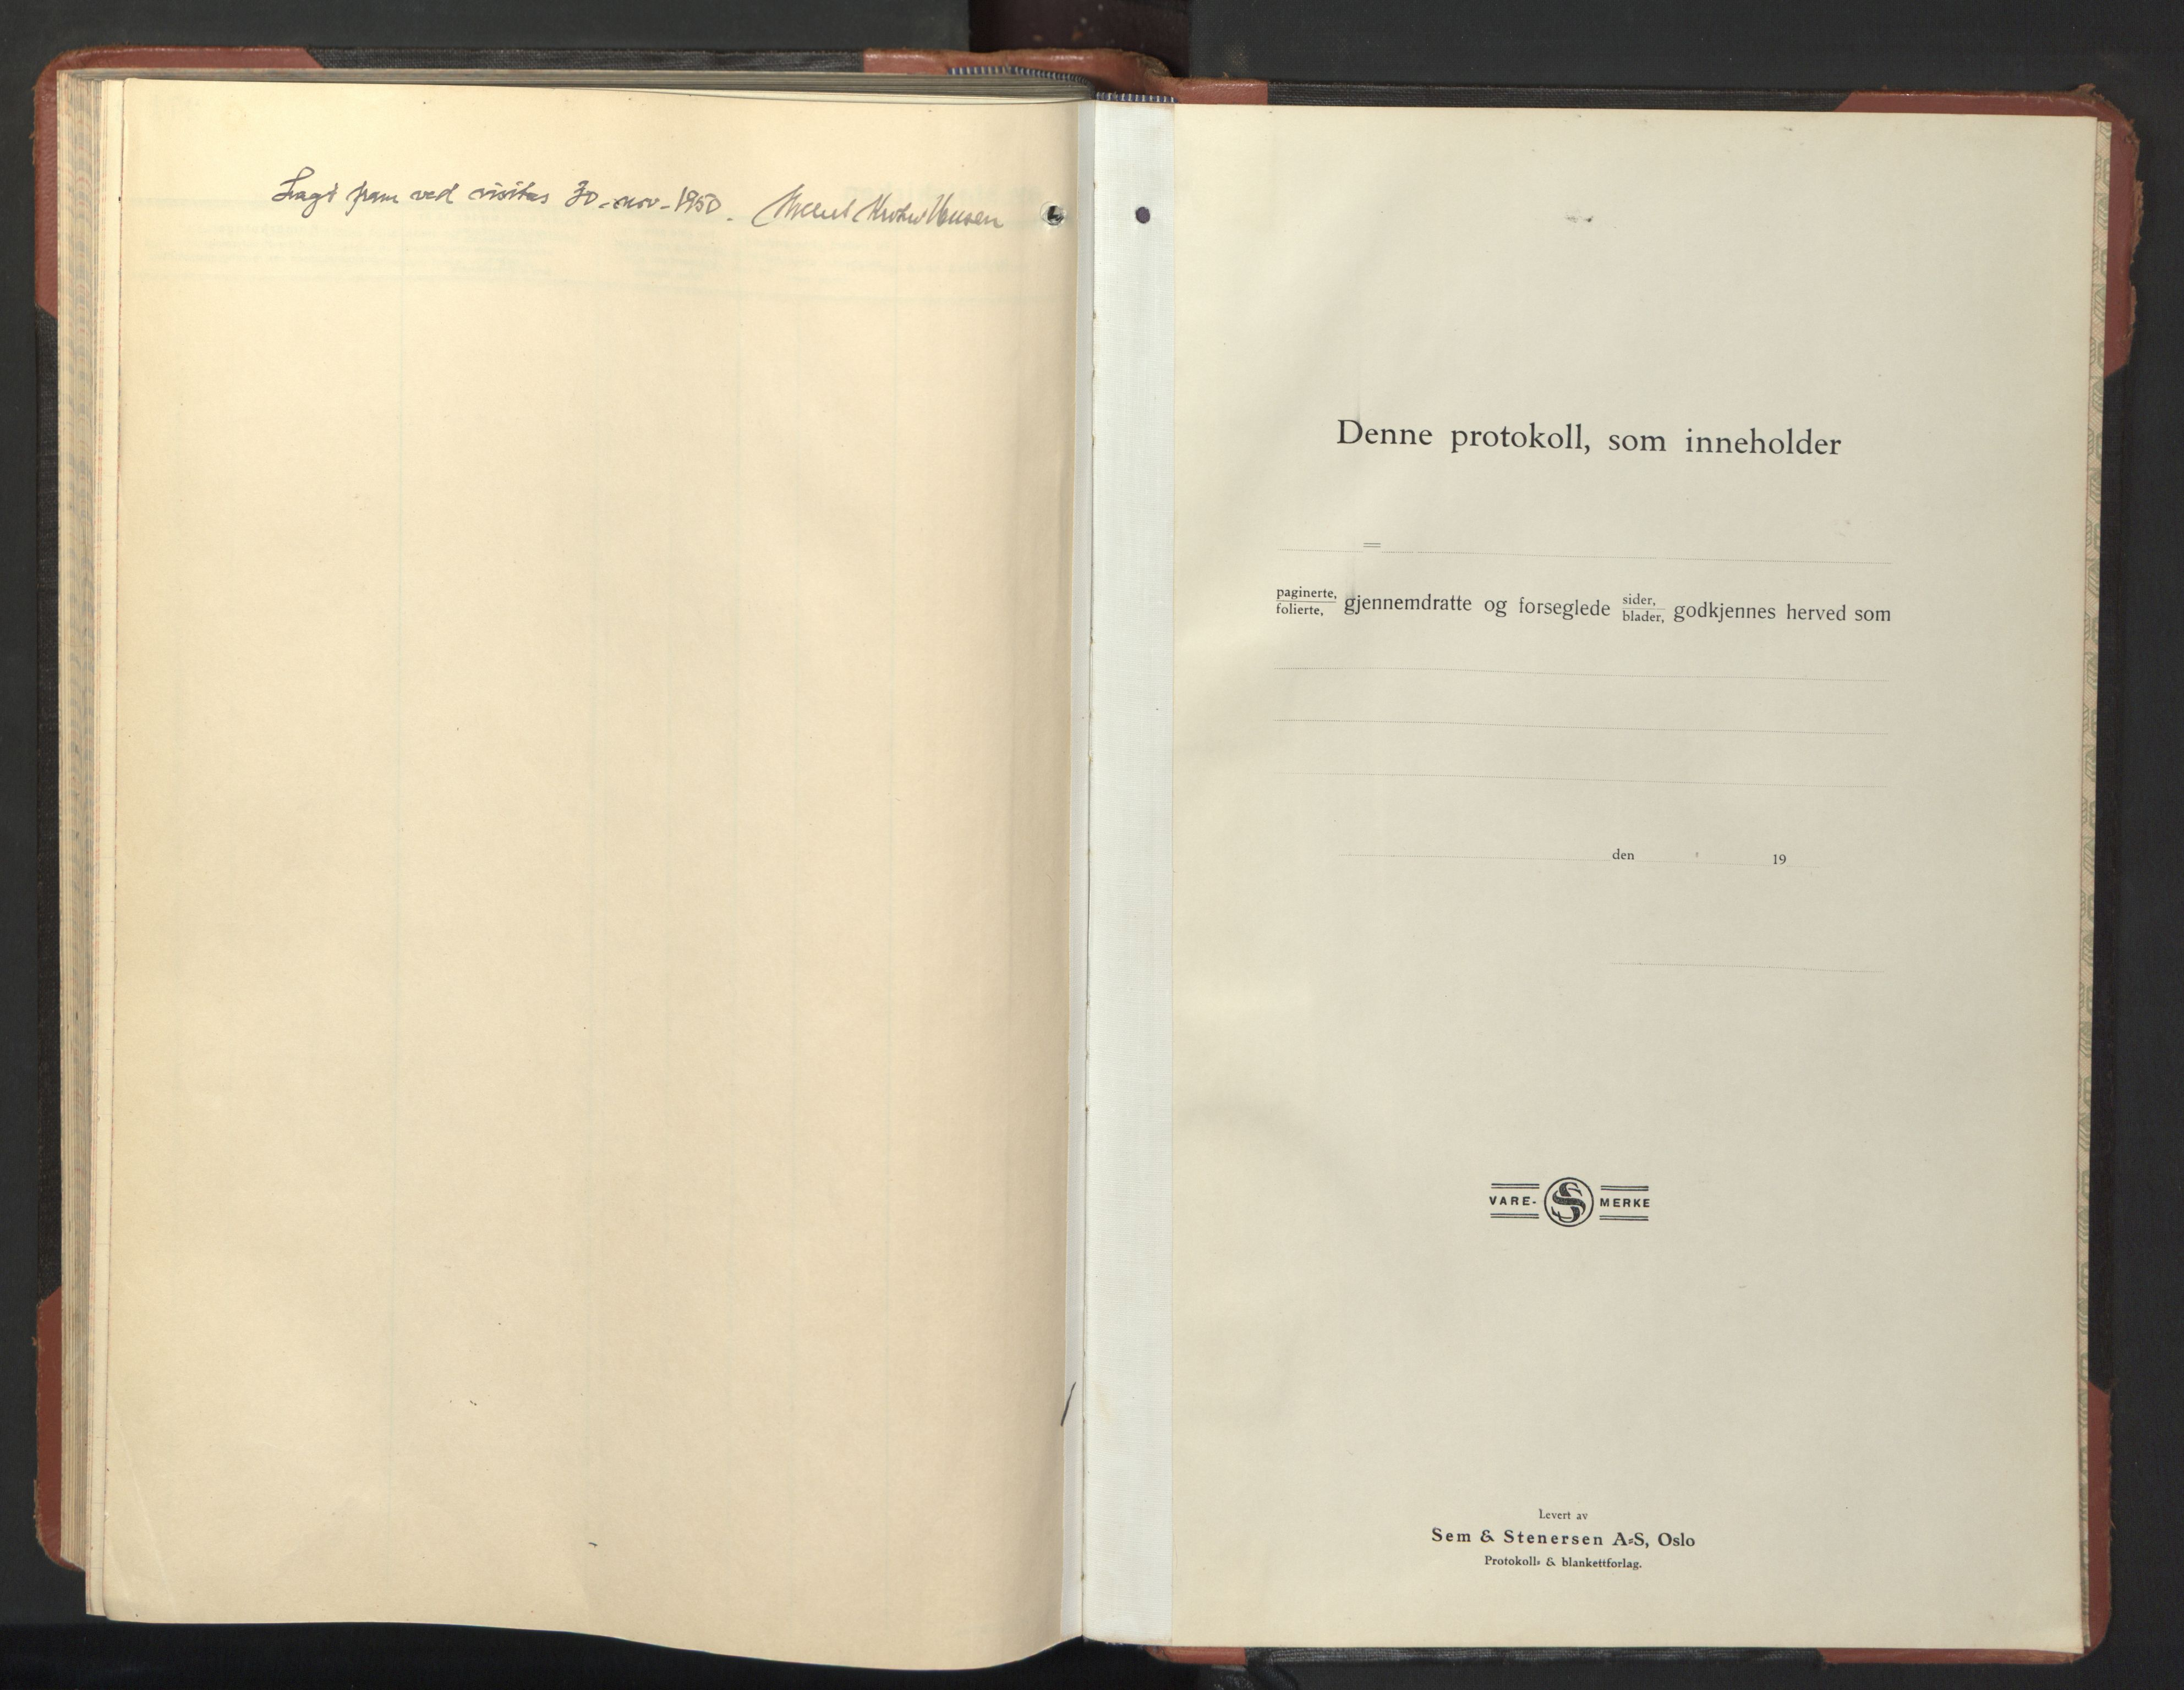 SAT, Ministerialprotokoller, klokkerbøker og fødselsregistre - Nordland, 801/L0038: Klokkerbok nr. 801C13, 1935-1951